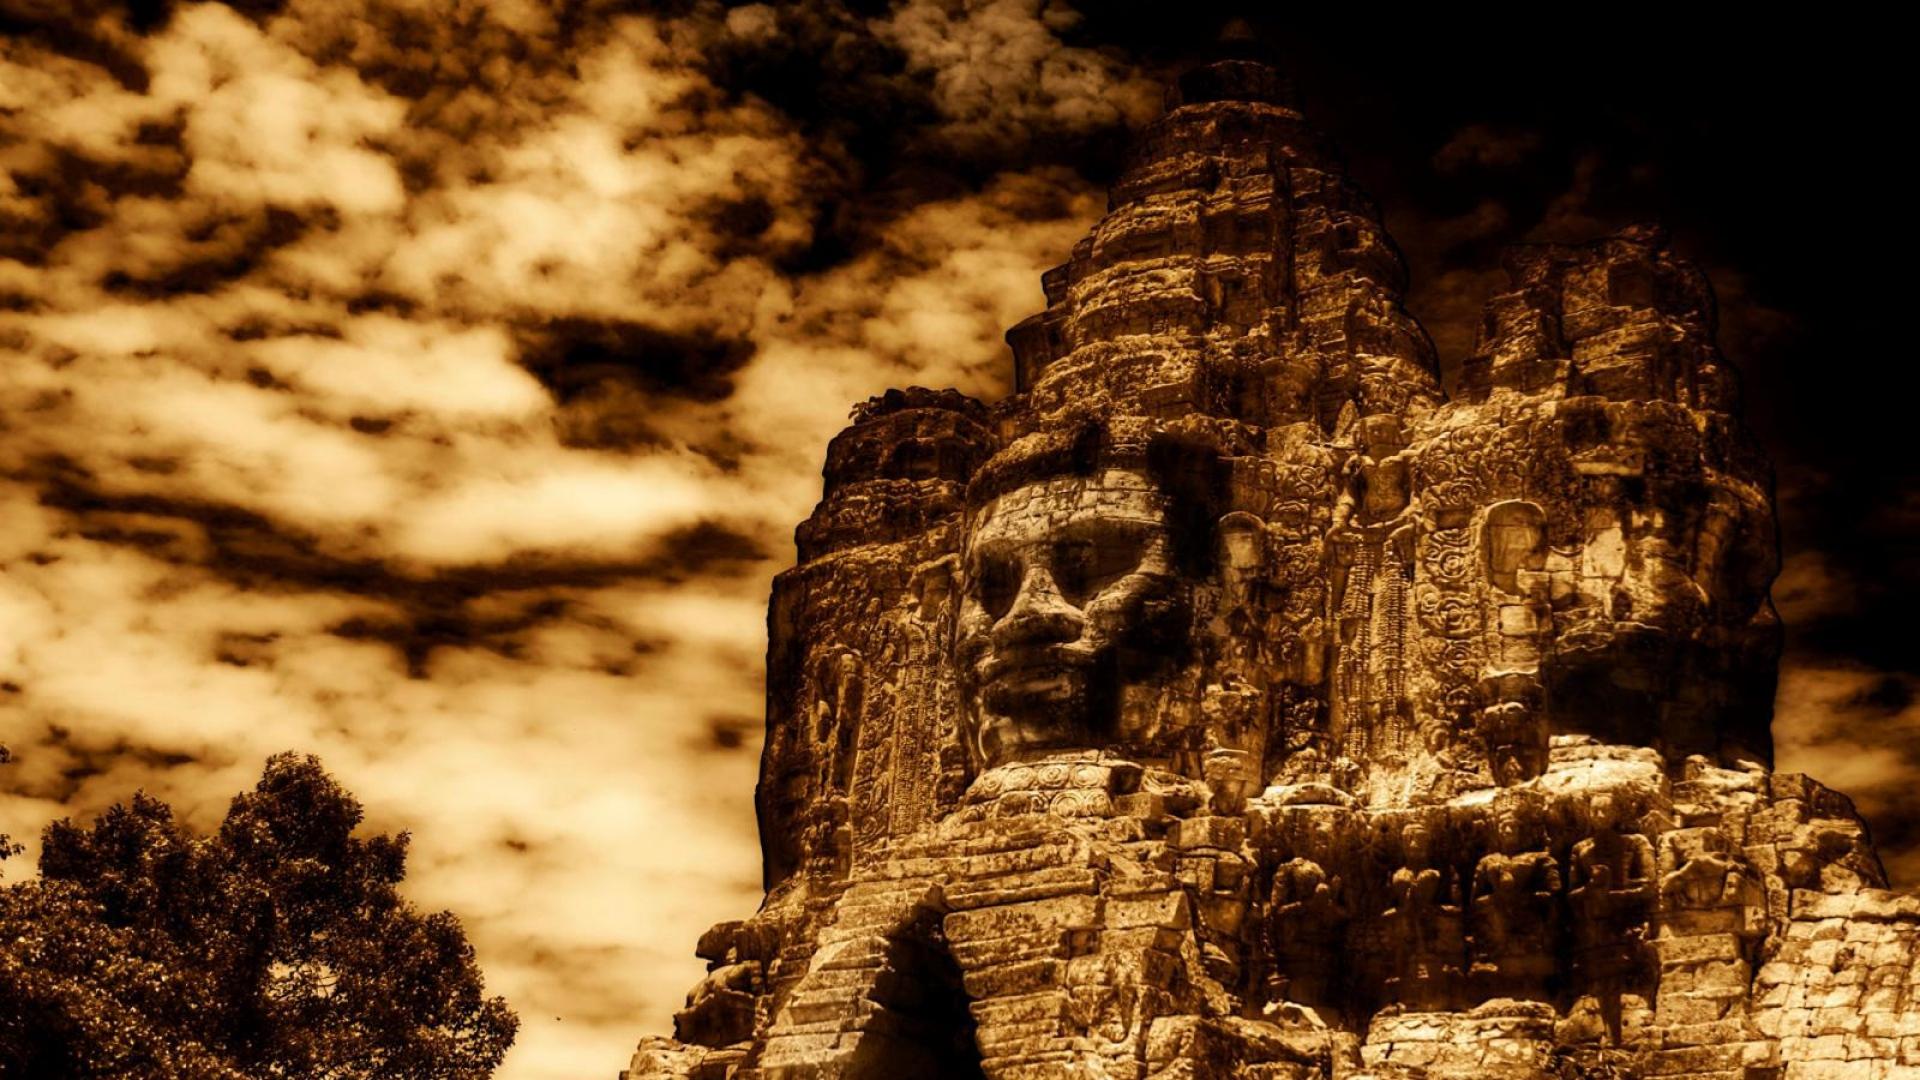 Download Wallpaper 1920x1080 Egypt Ruins Pharaoh Monument Hdr